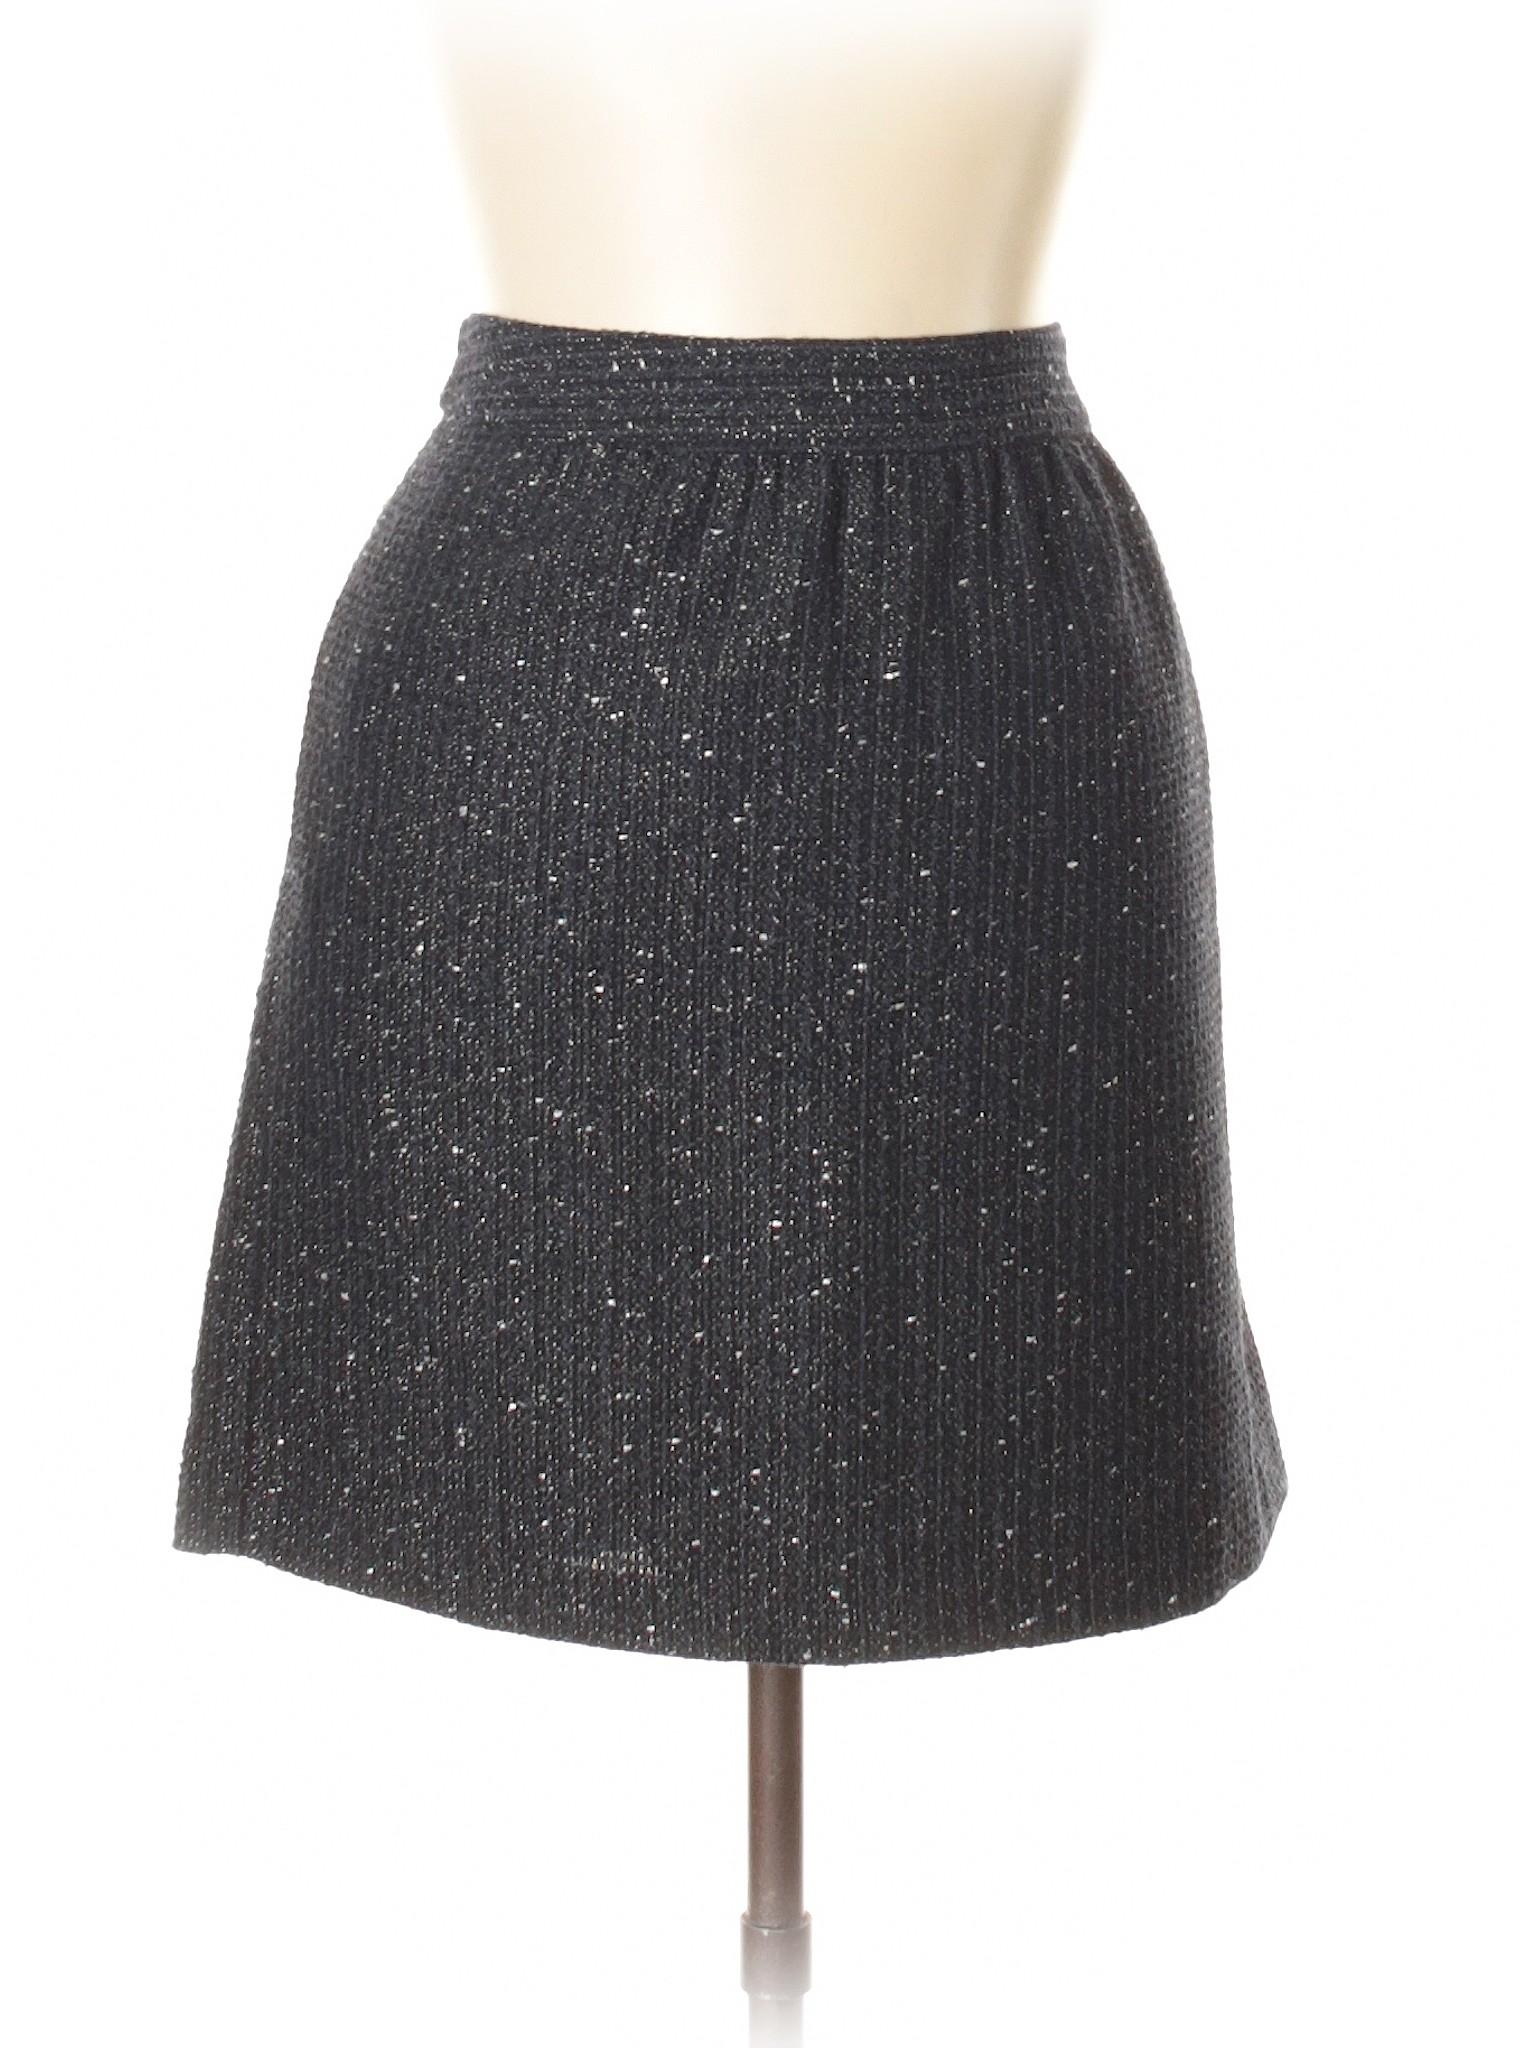 Taylor Leisure winter Skirt Casual LOFT Ann vwvExOA0q